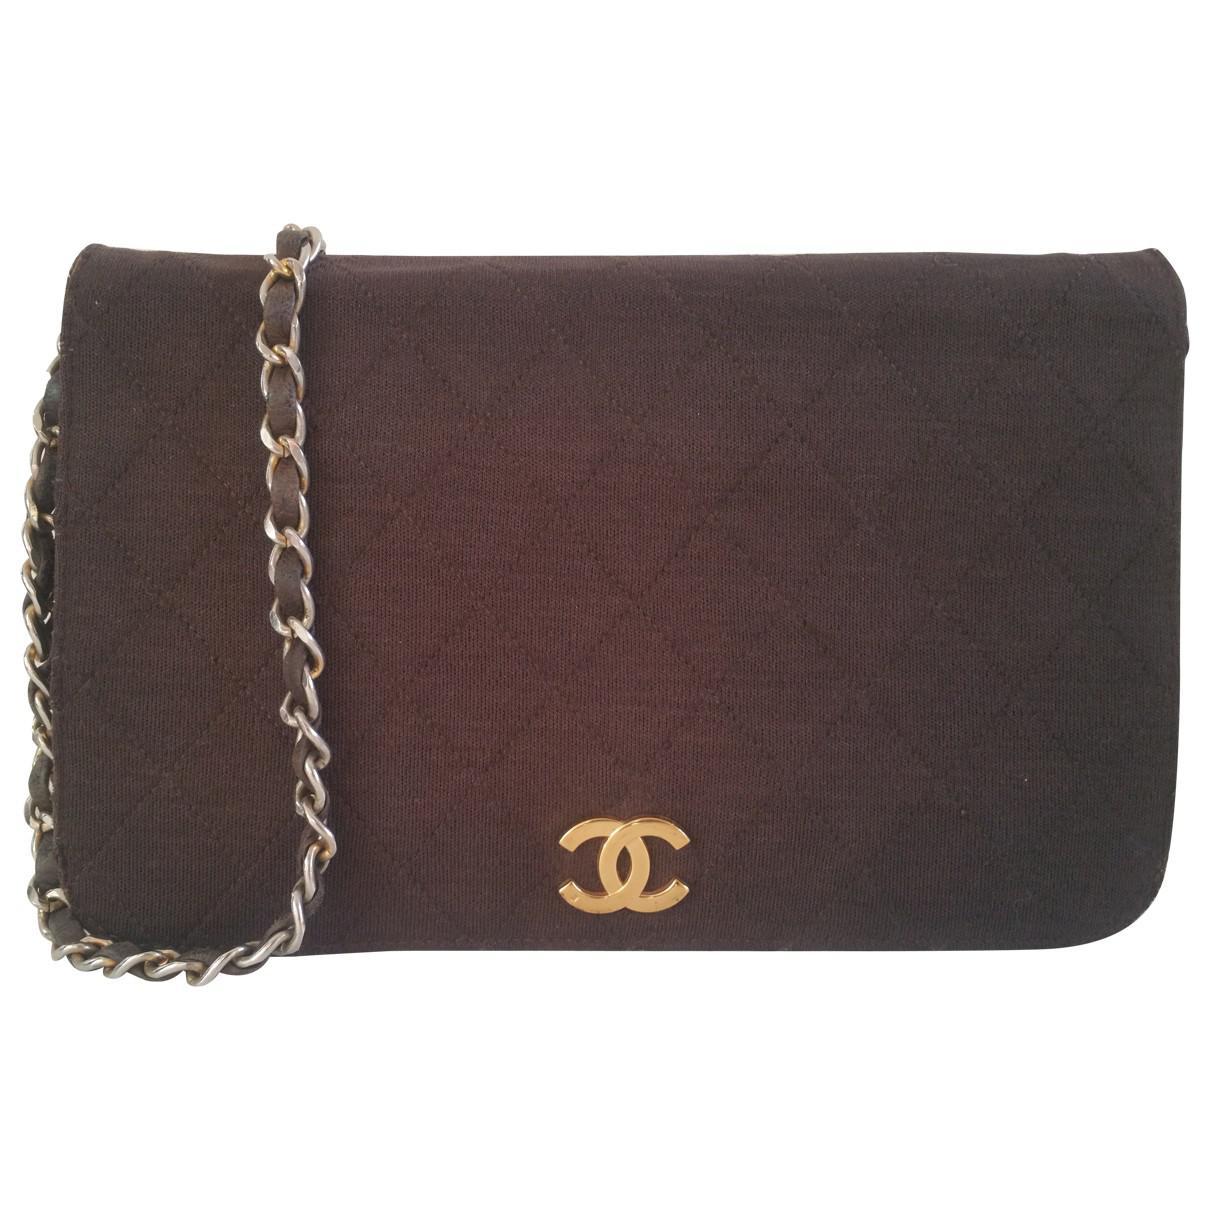 Pre-owned - Timeless cloth crossbody bag Chanel 0n7YaHLUj